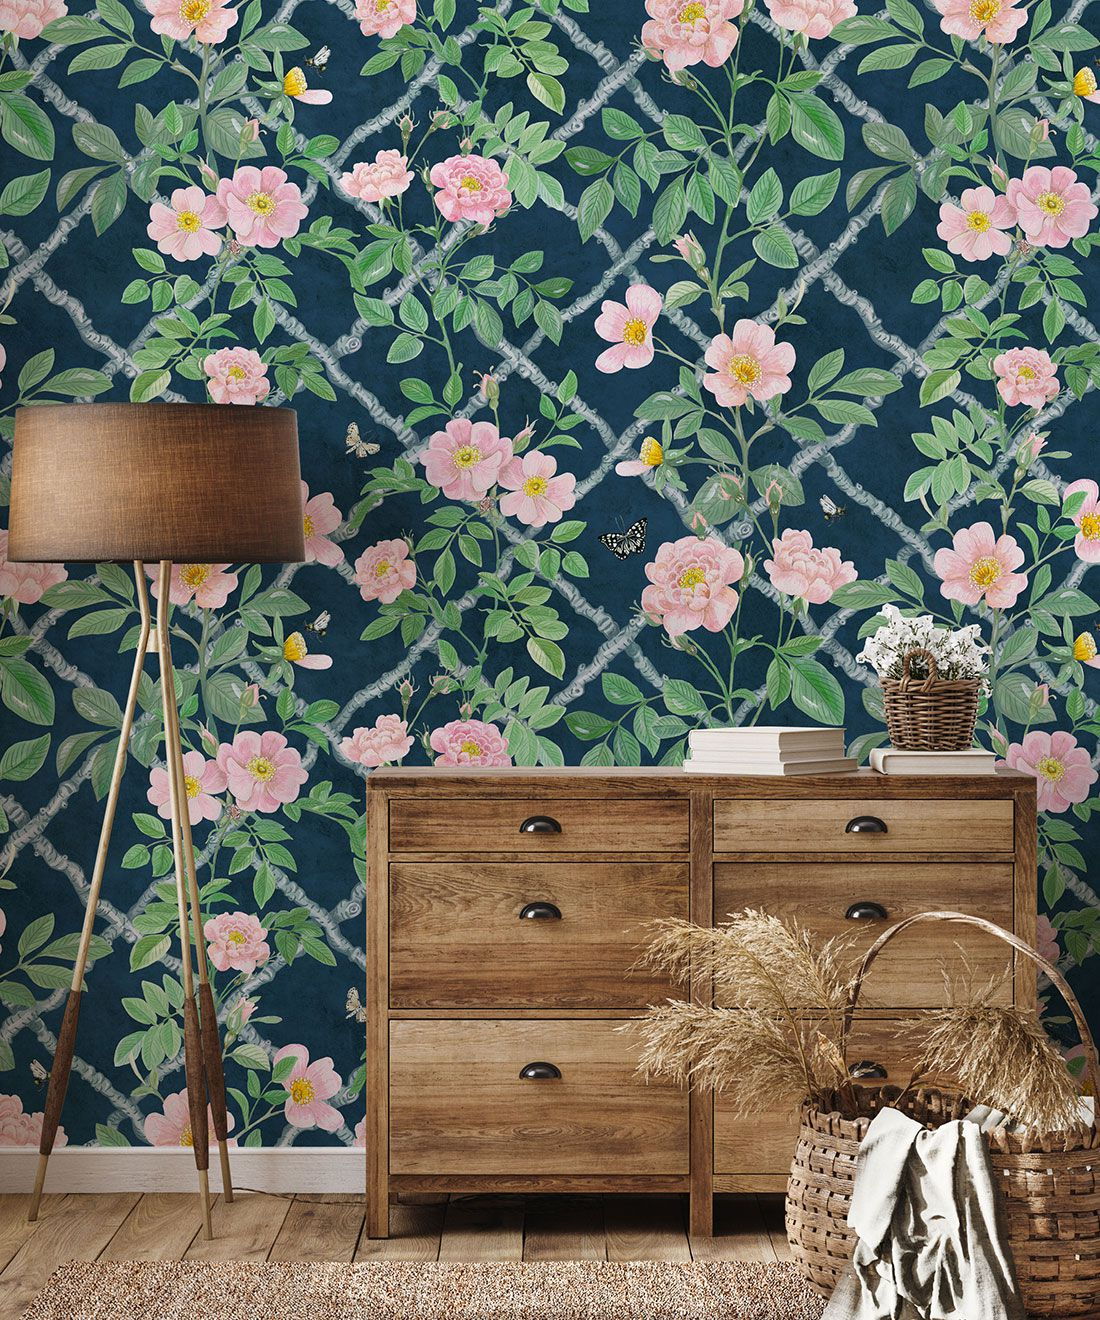 Treilage Wallpaper • Floral Wallpaper • Rose Pink • Insitu